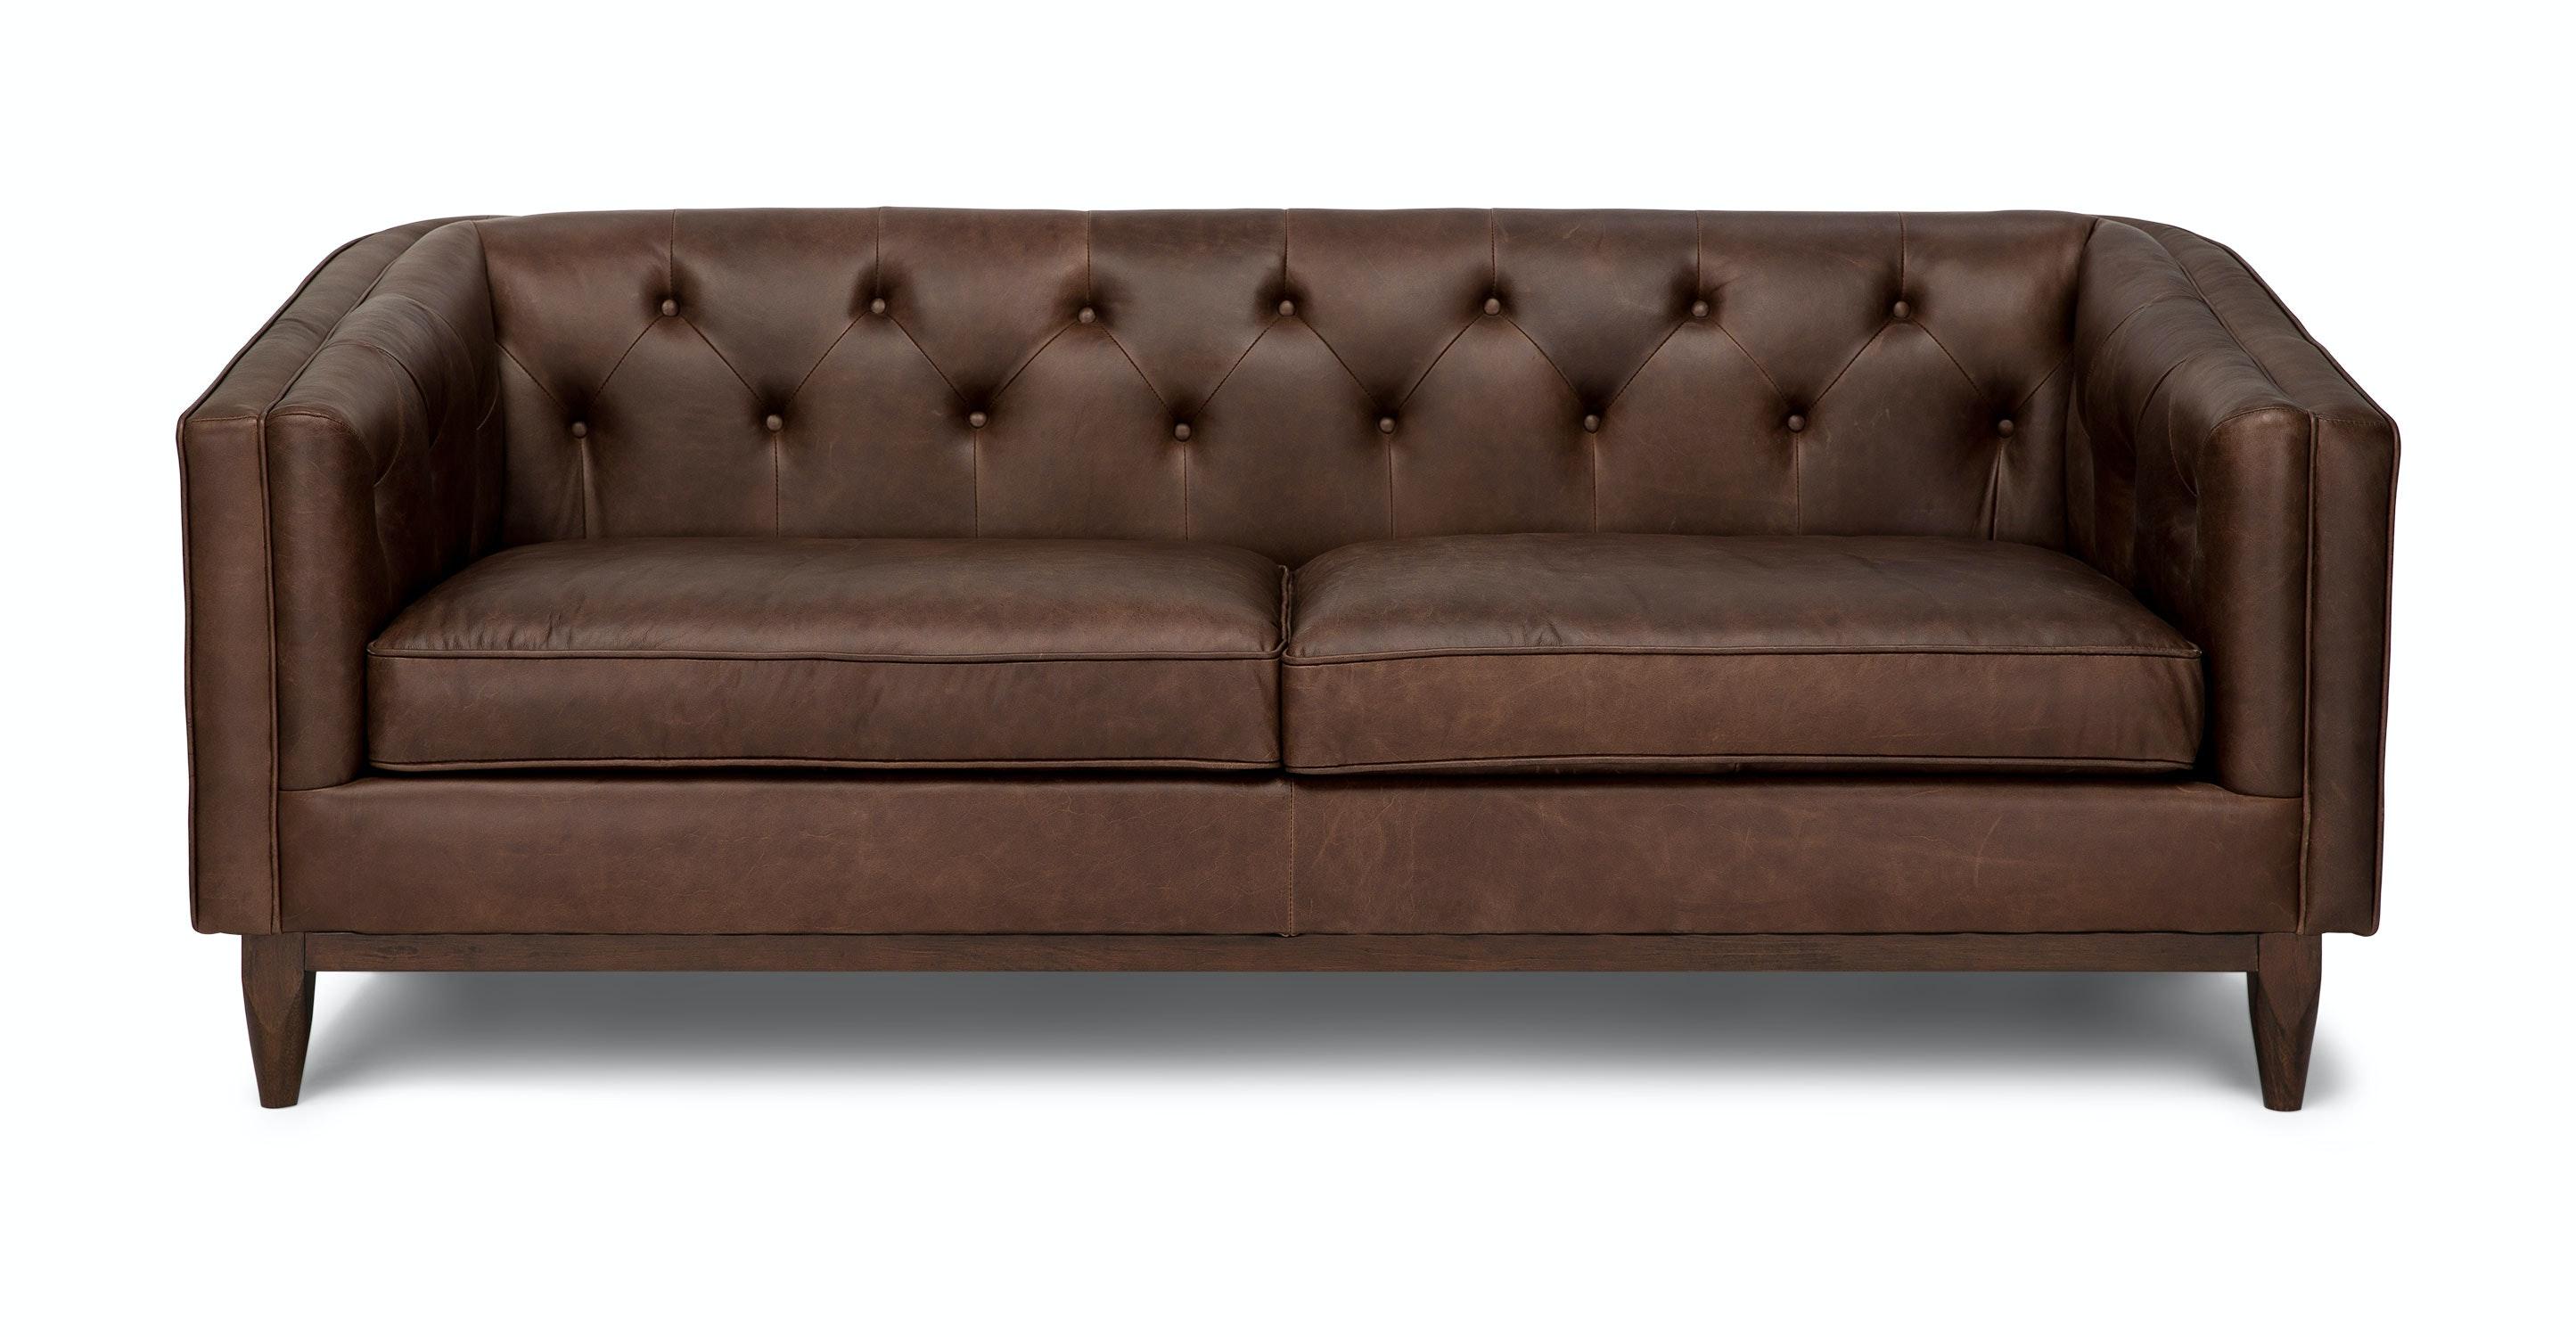 Alcott Oxford Black Sofa Sofas Article